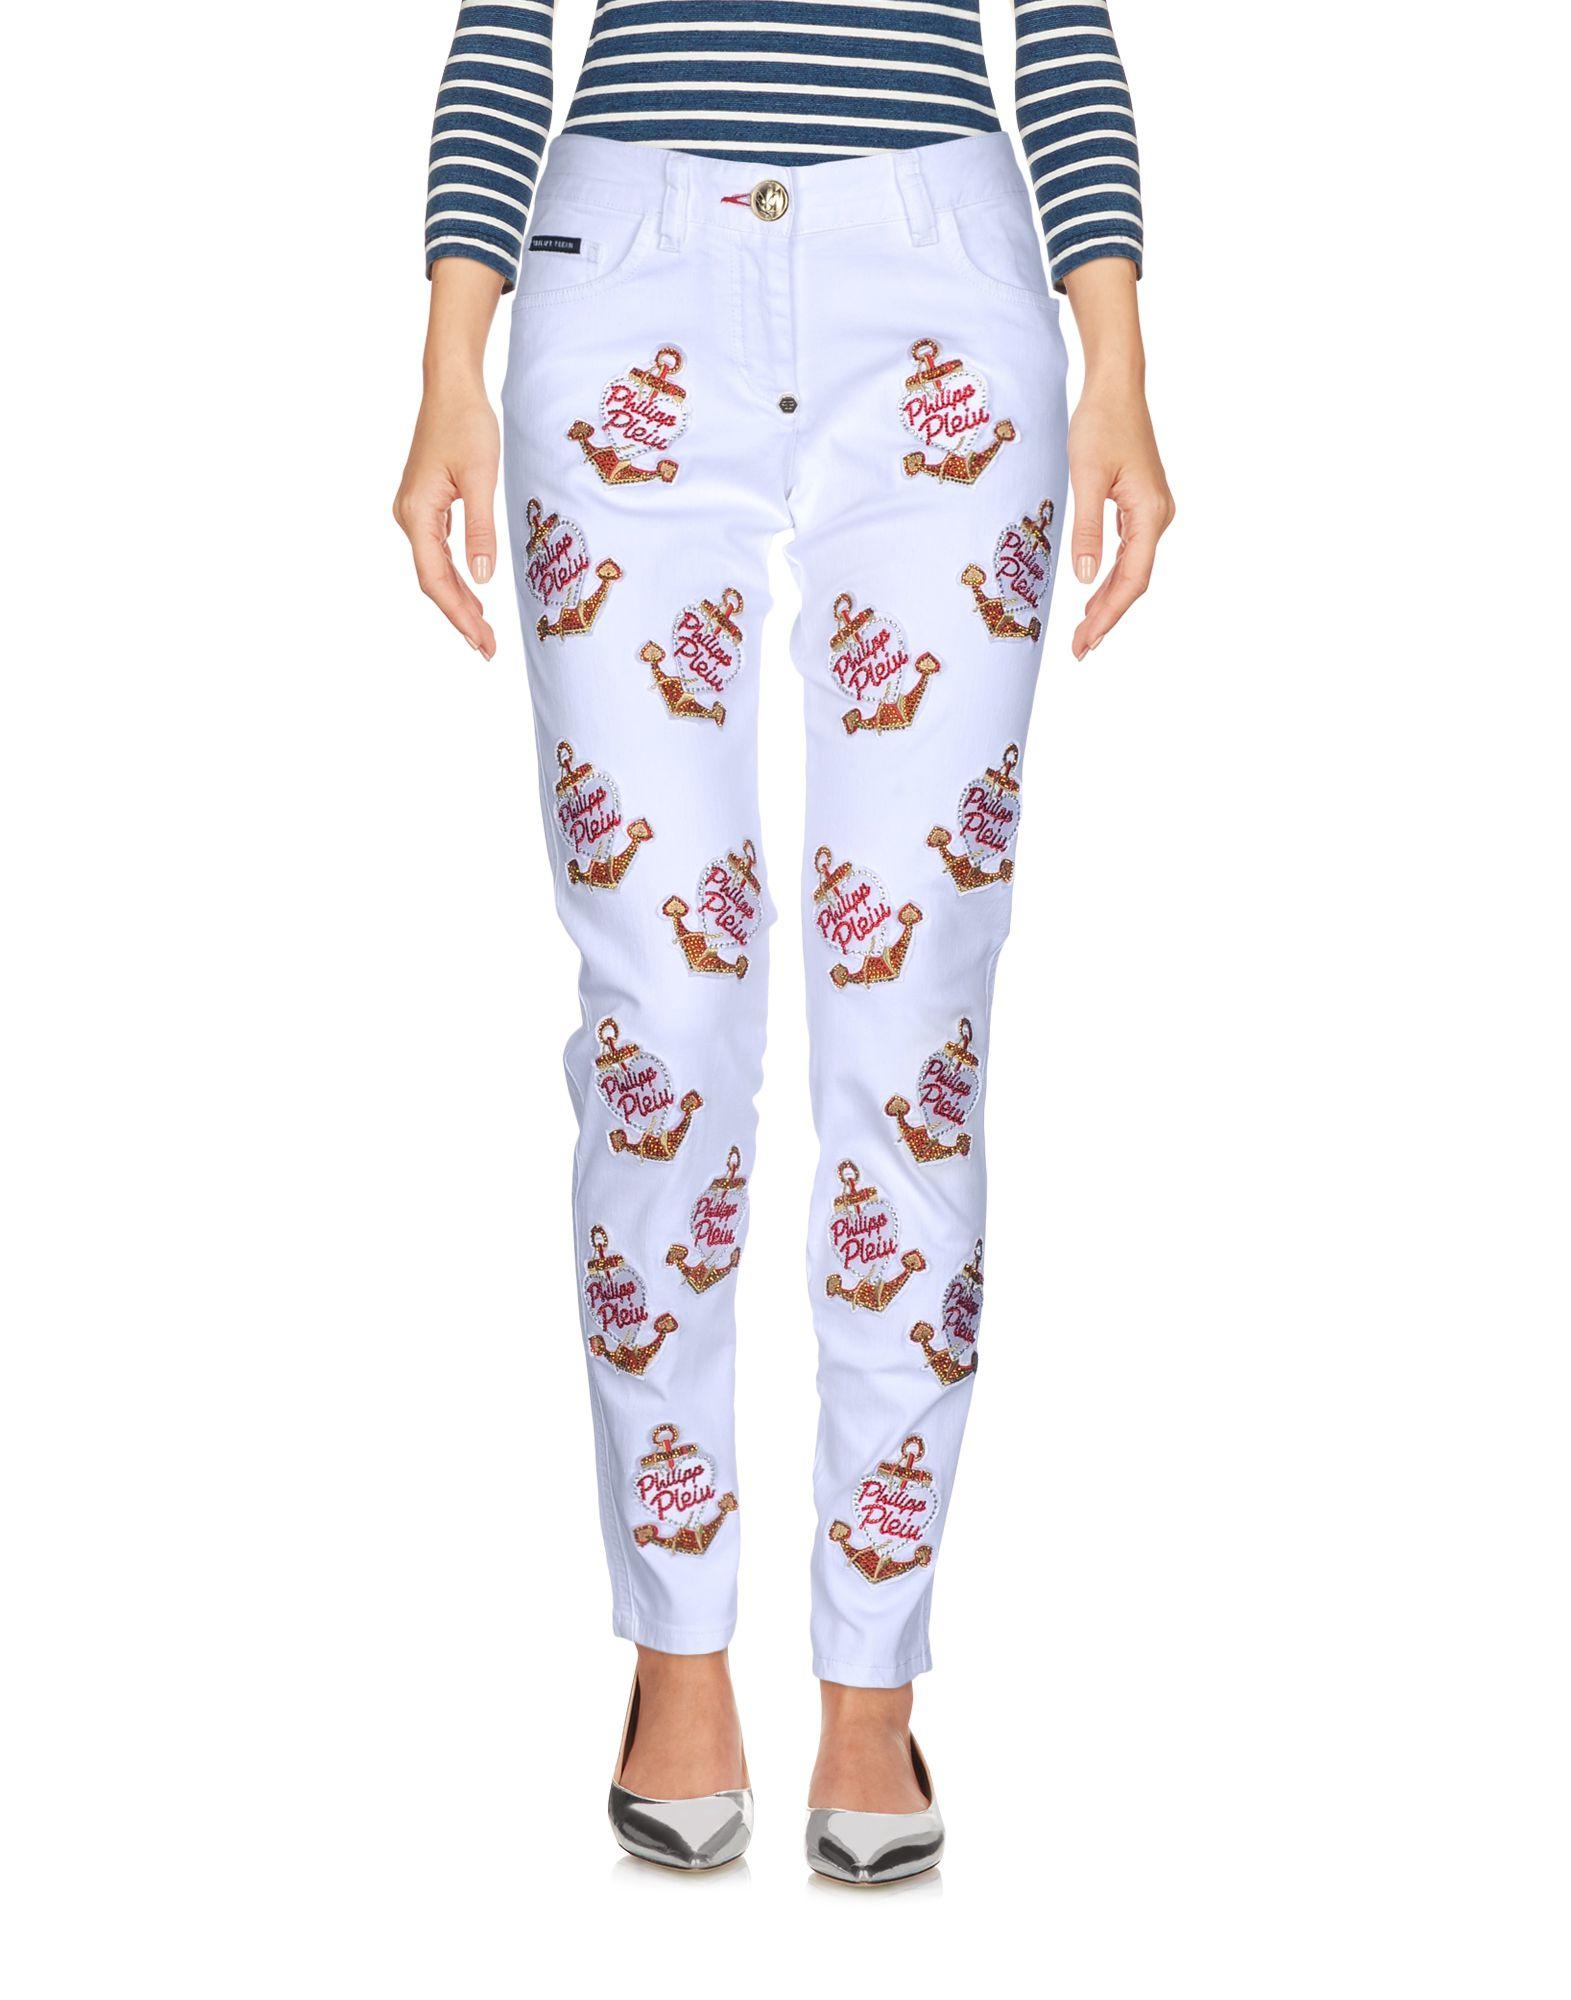 Pantaloni Jeans Philipp Plein Donna - Acquista online su 5fJwhB4K